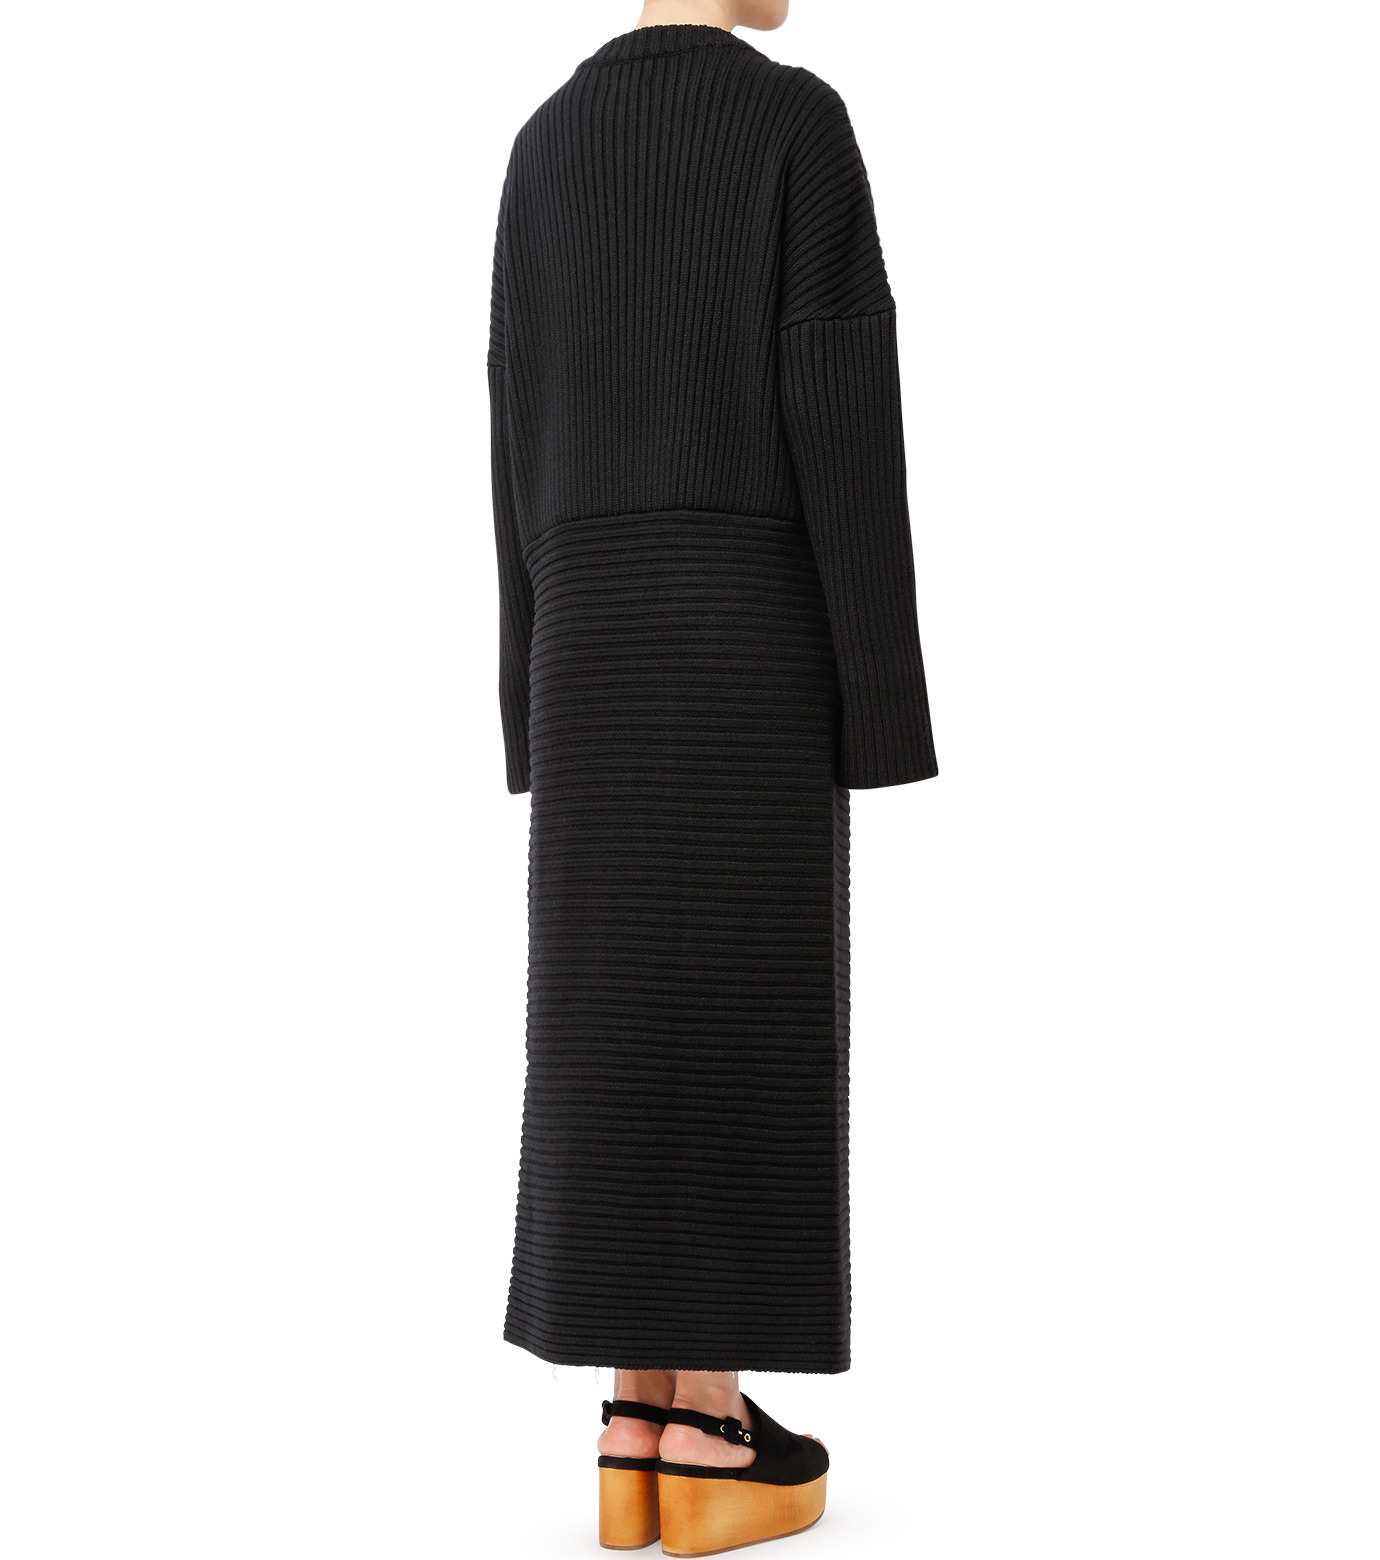 CHRISTIAN DADA(クリスチャン ダダ)のMaxi Knit Dress w/Slit-BLACK(ニット/knit)-16W-D-0806-13 拡大詳細画像3